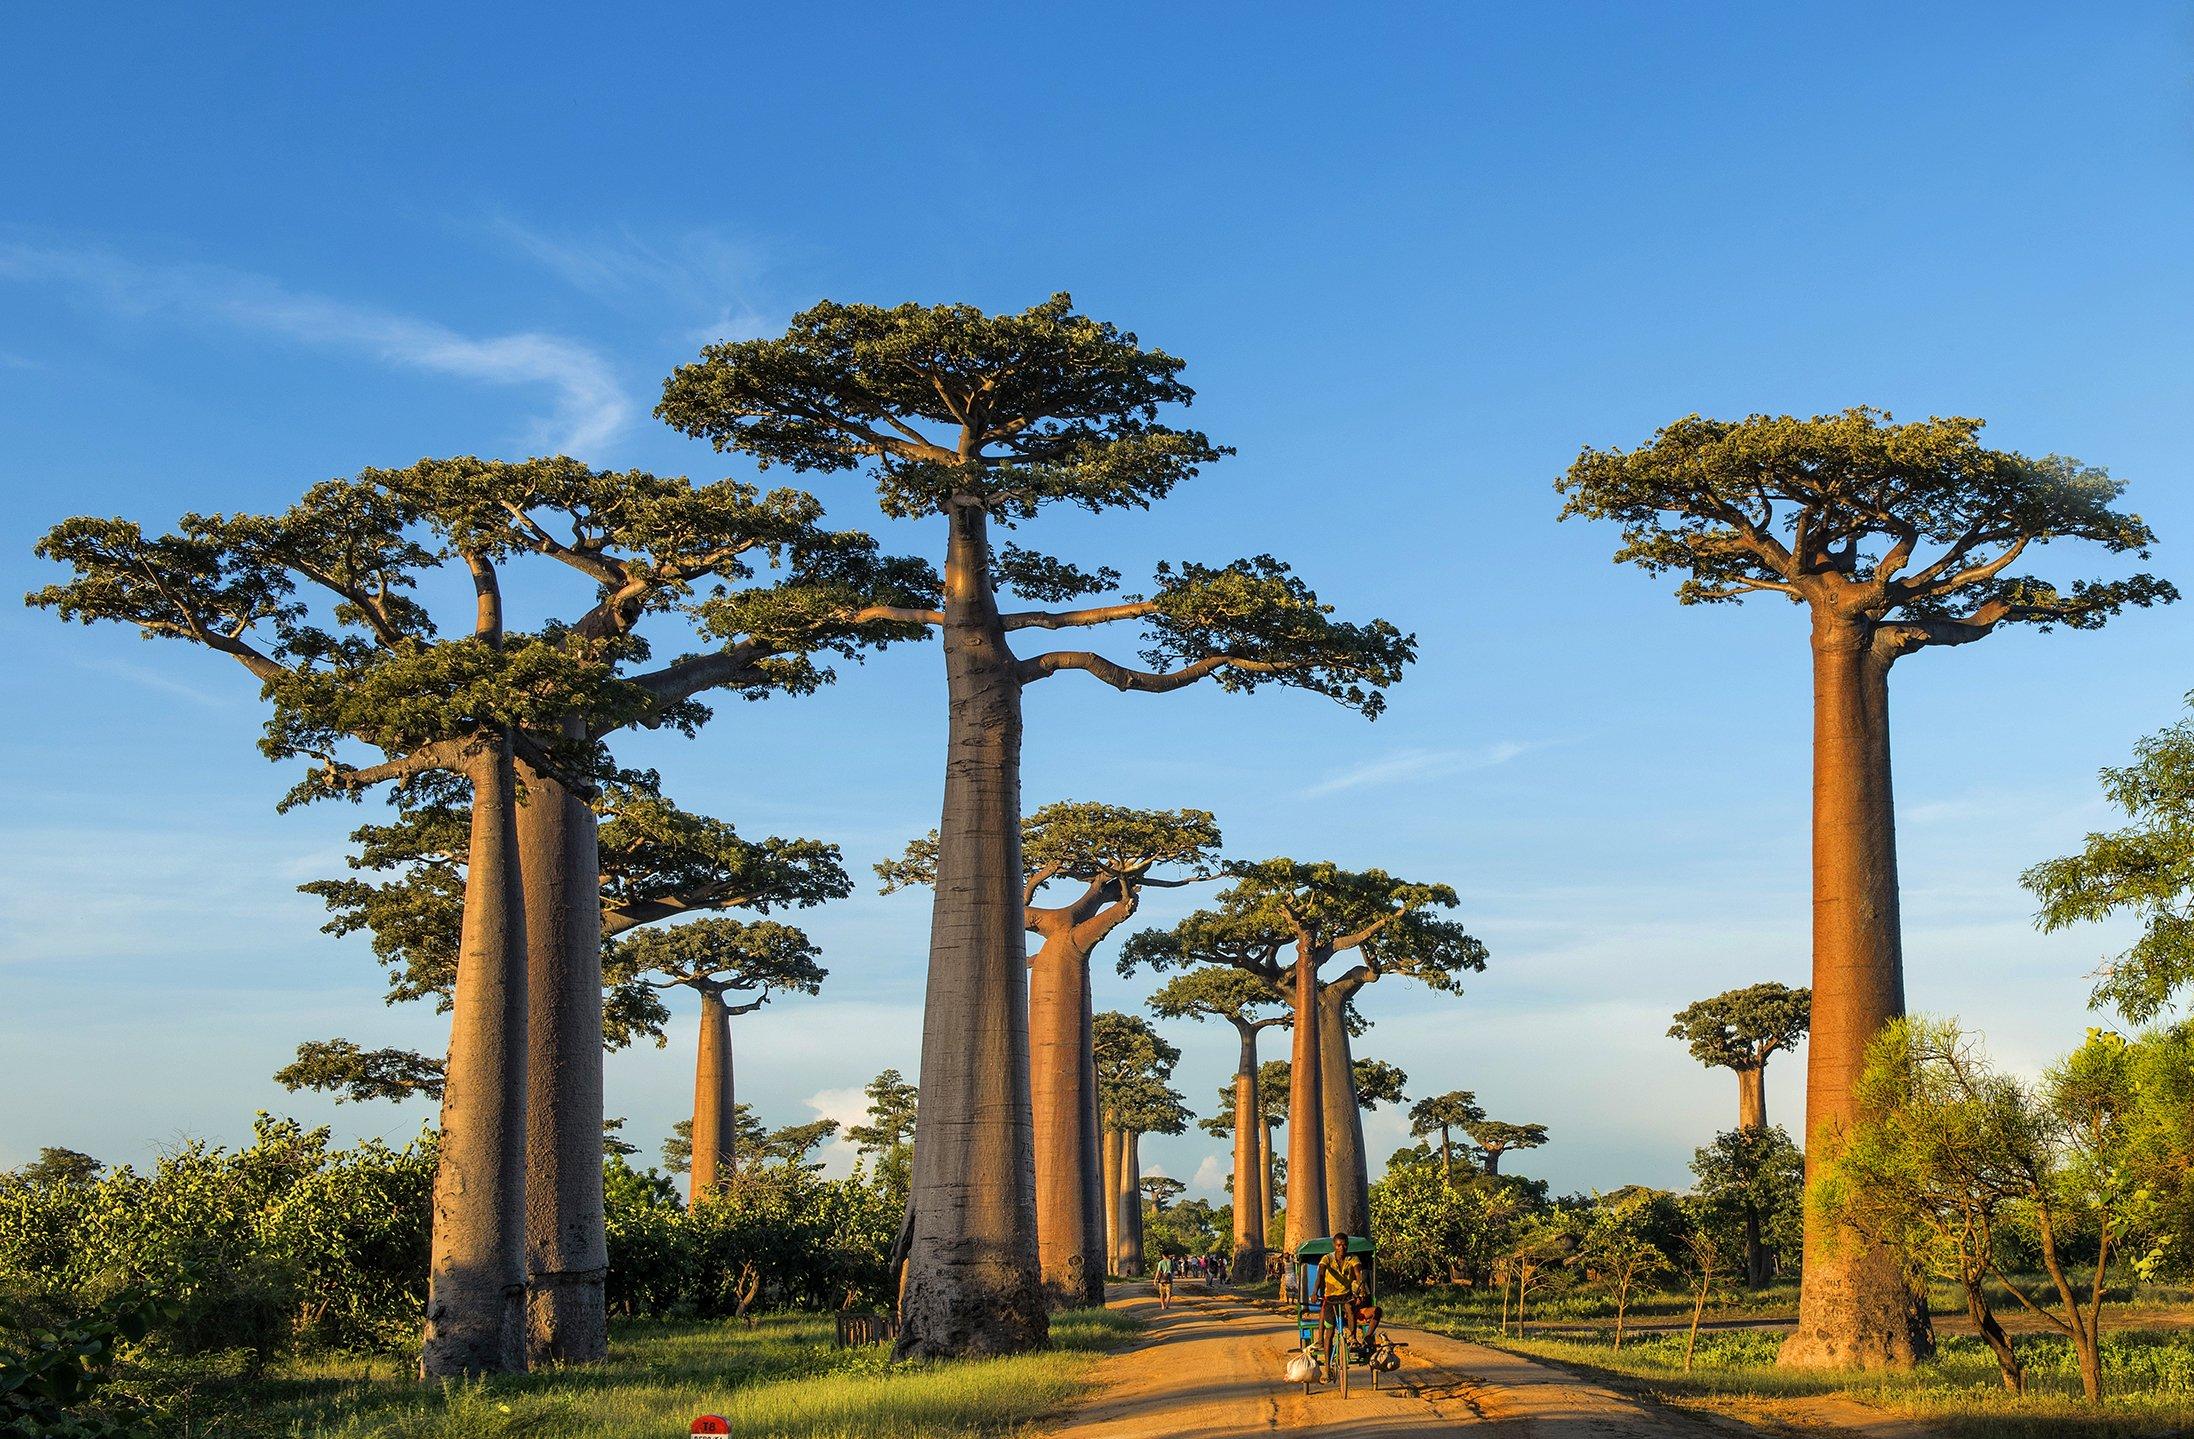 TH_Baobab_Allee12